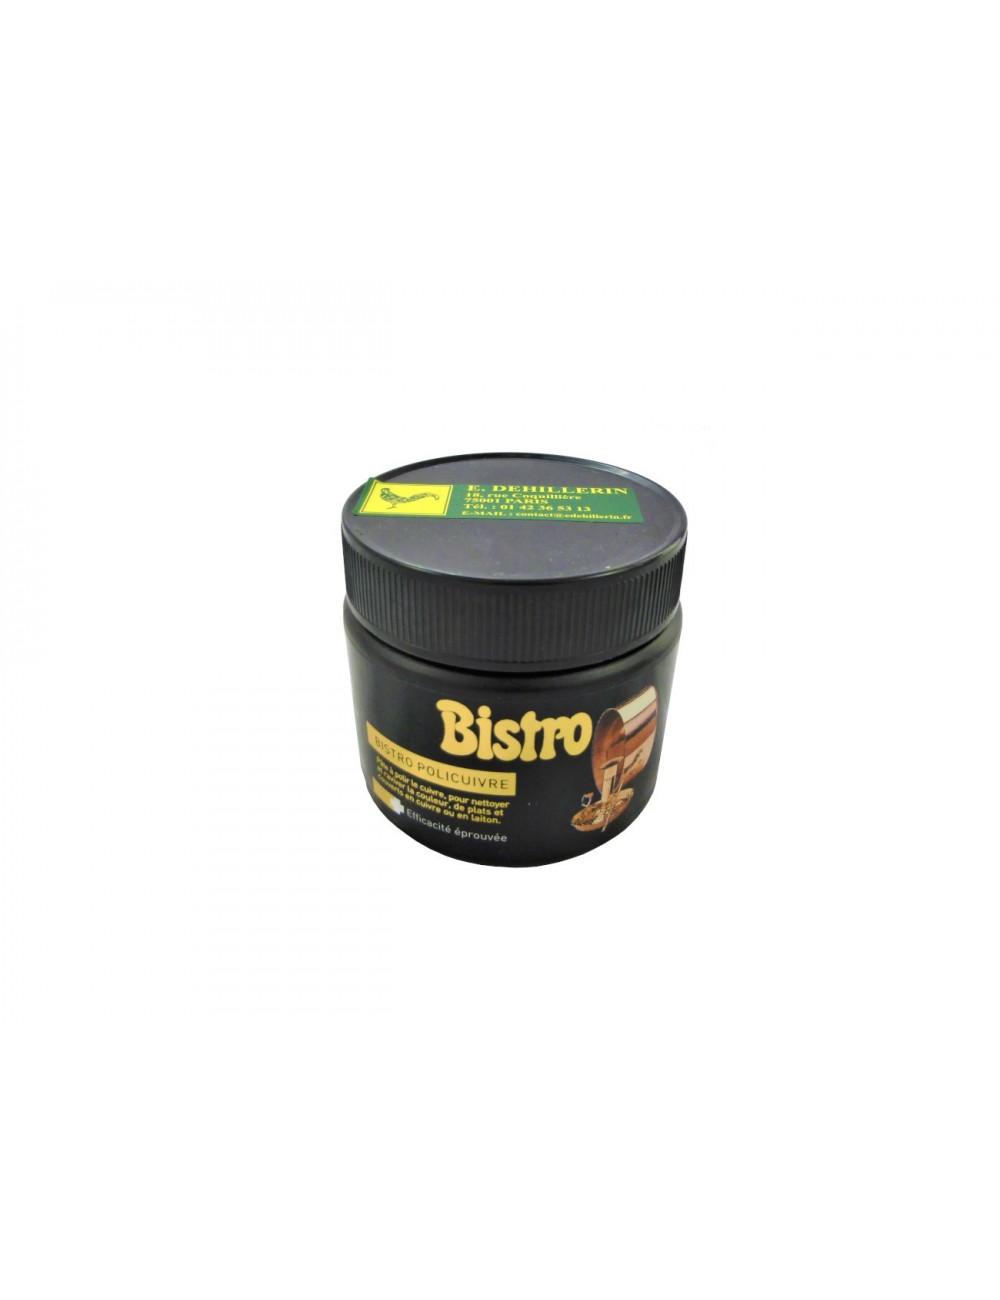 BISTRO COPPER CLEANING CREAM - SMALL SIZE